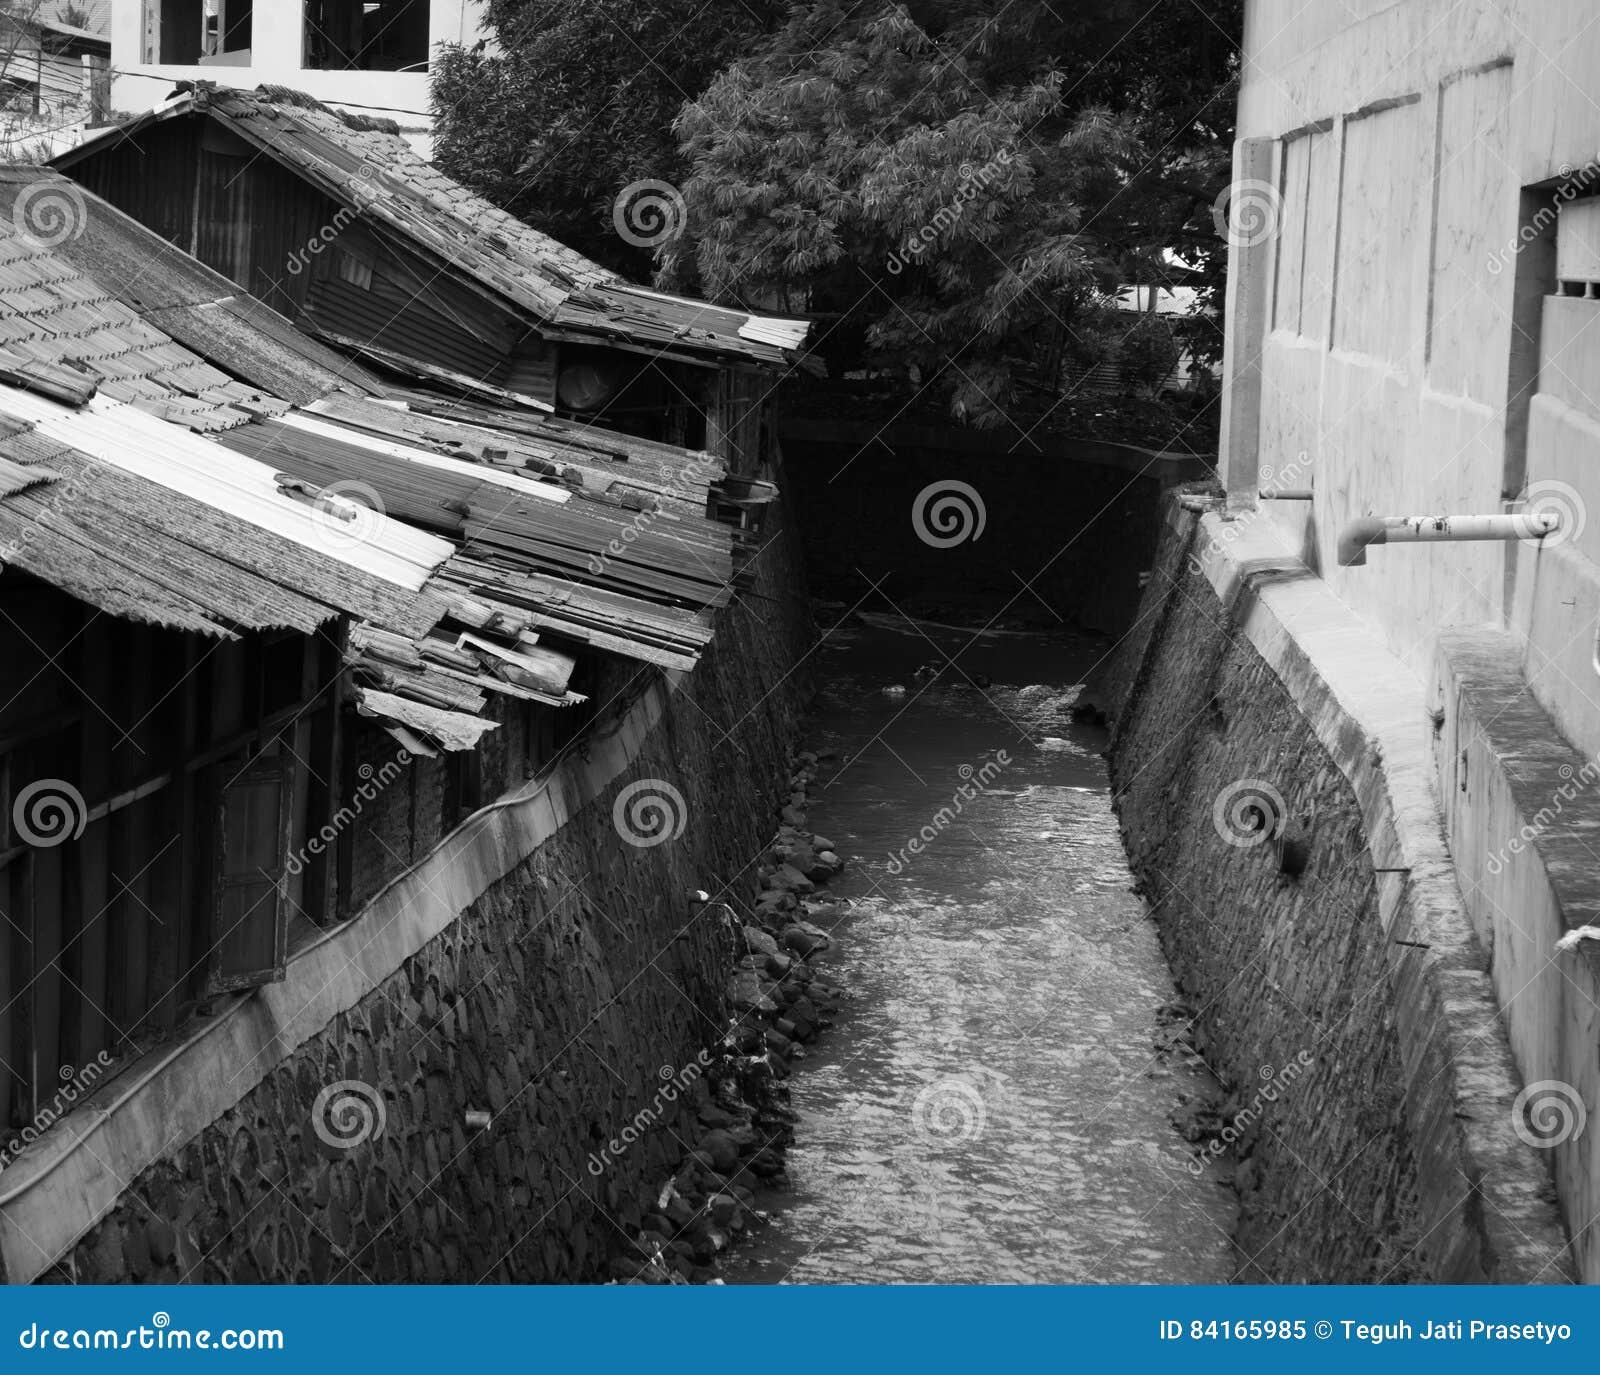 Slums Near Dirty Ditch In Black White Theme Photo Taken In